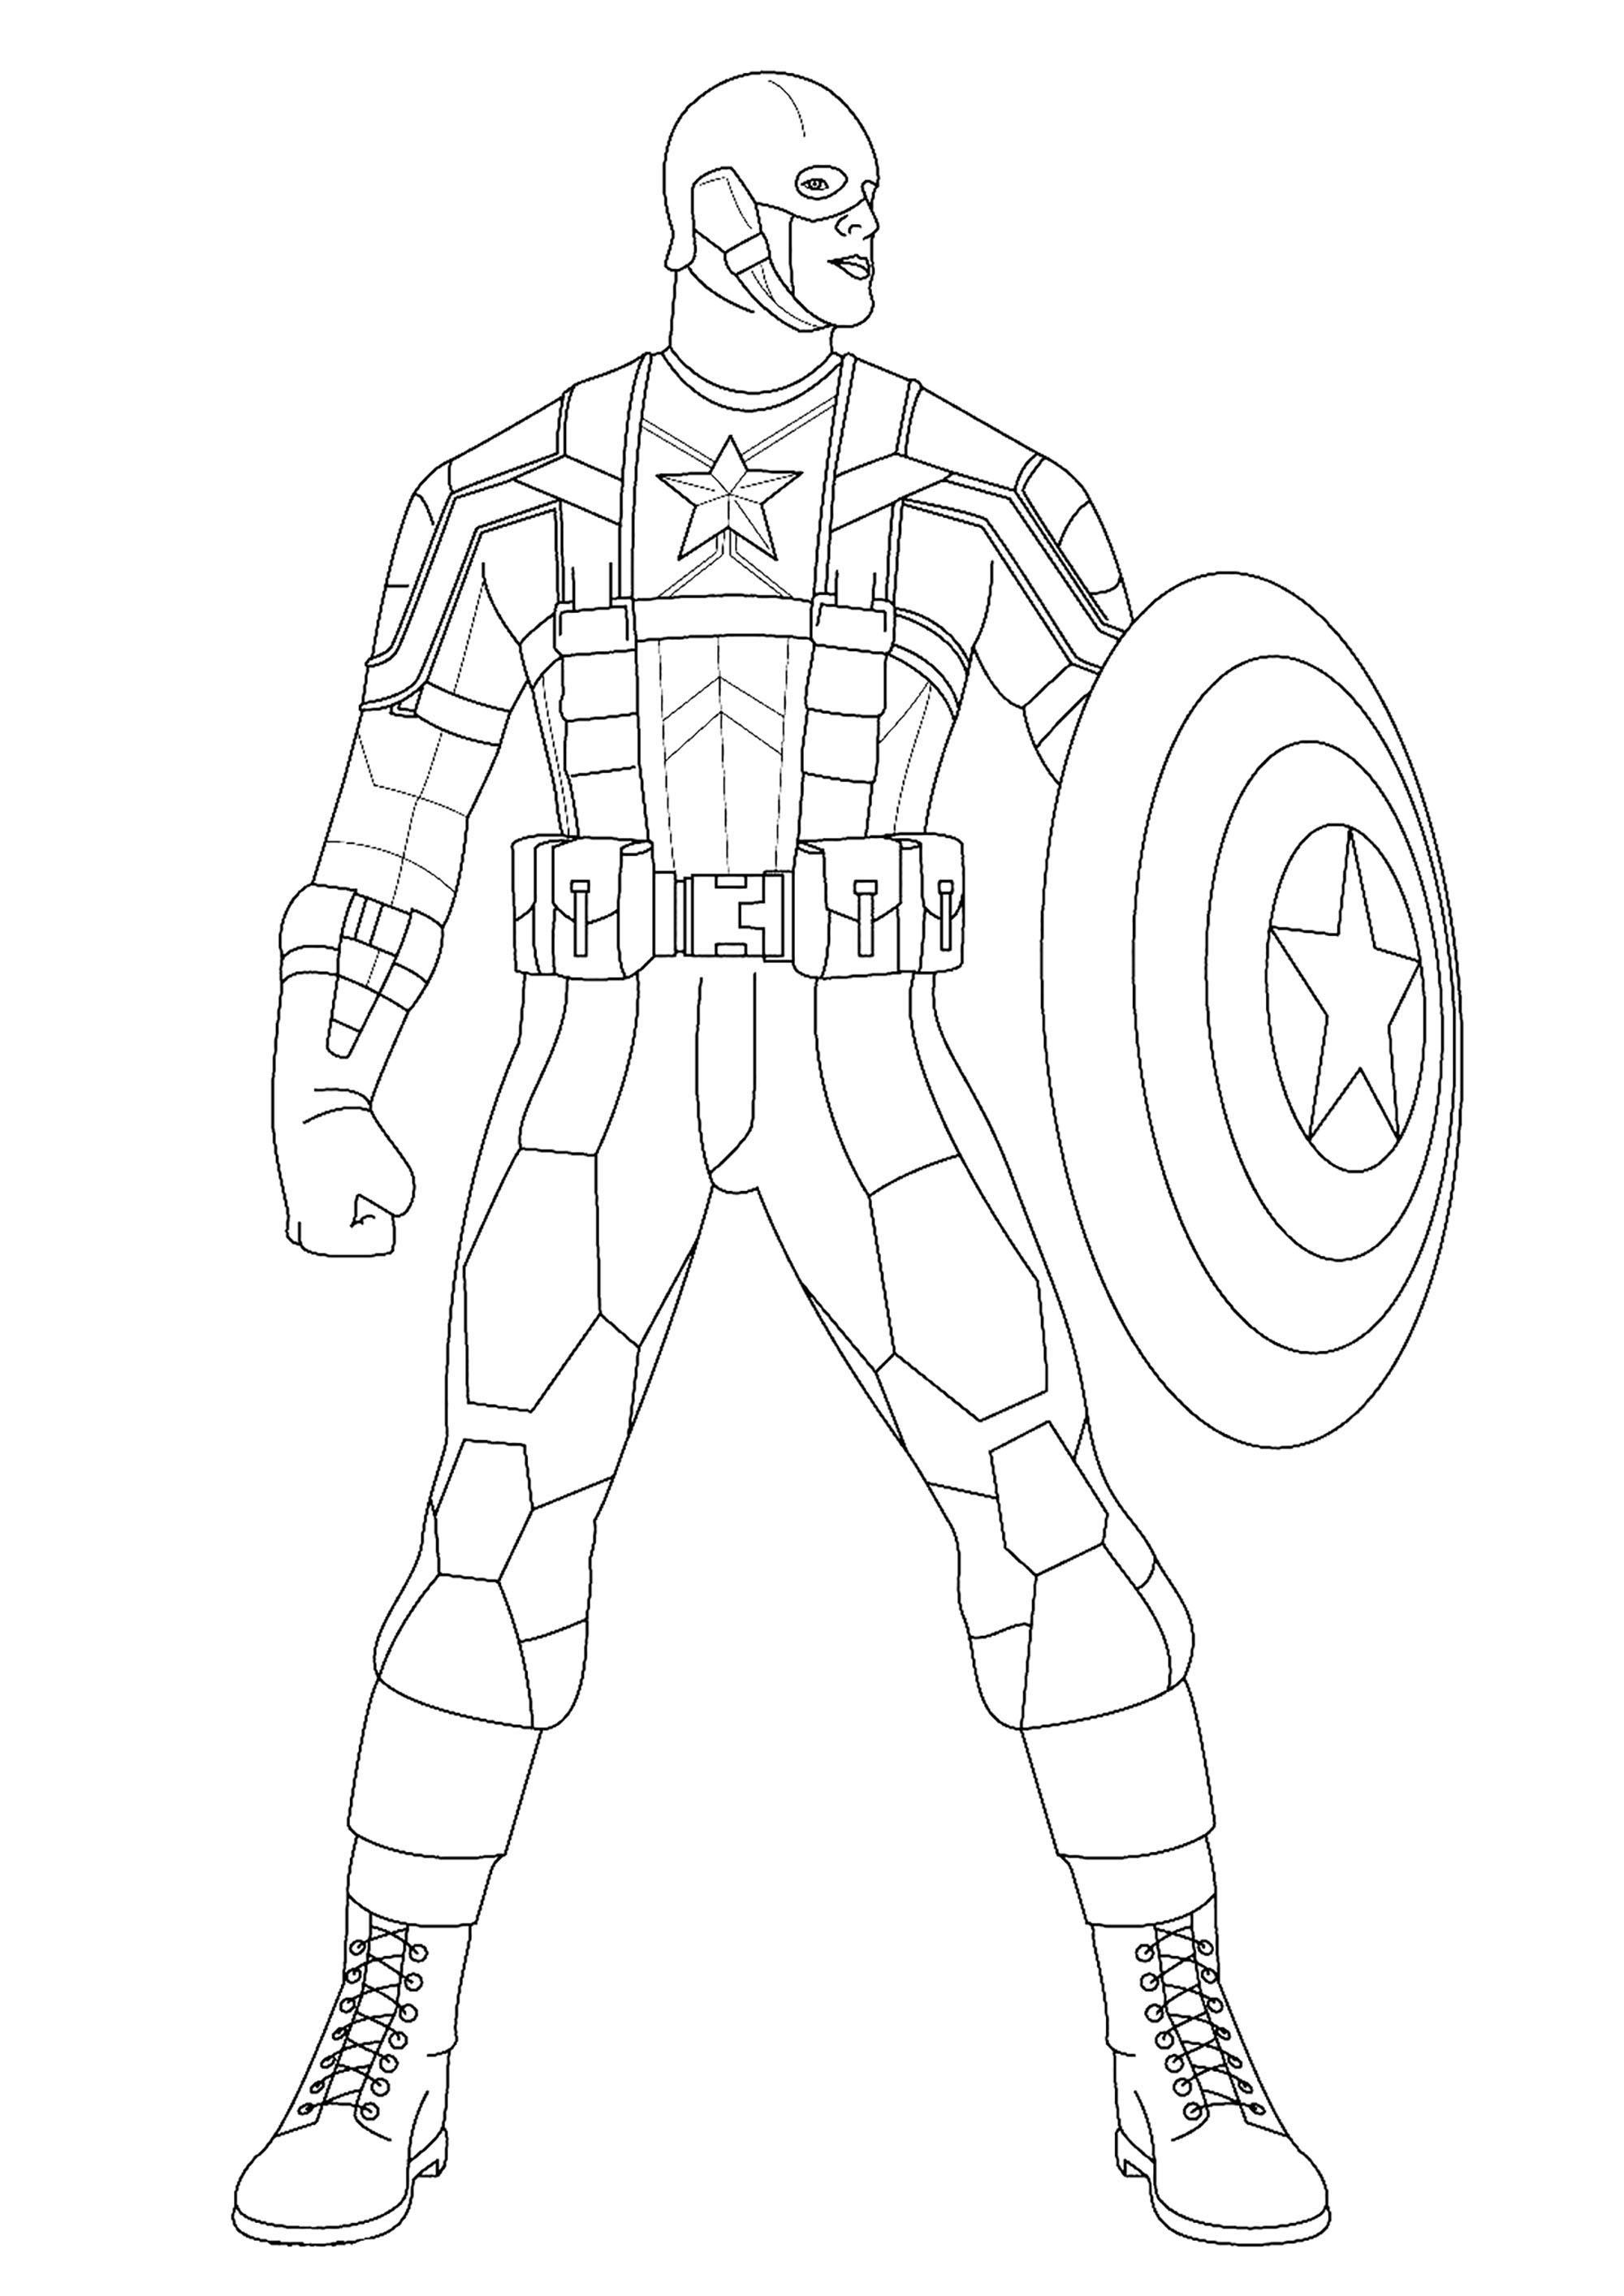 Captain America Coloring Page : captain, america, coloring, Captain, America, Coloring, Pages